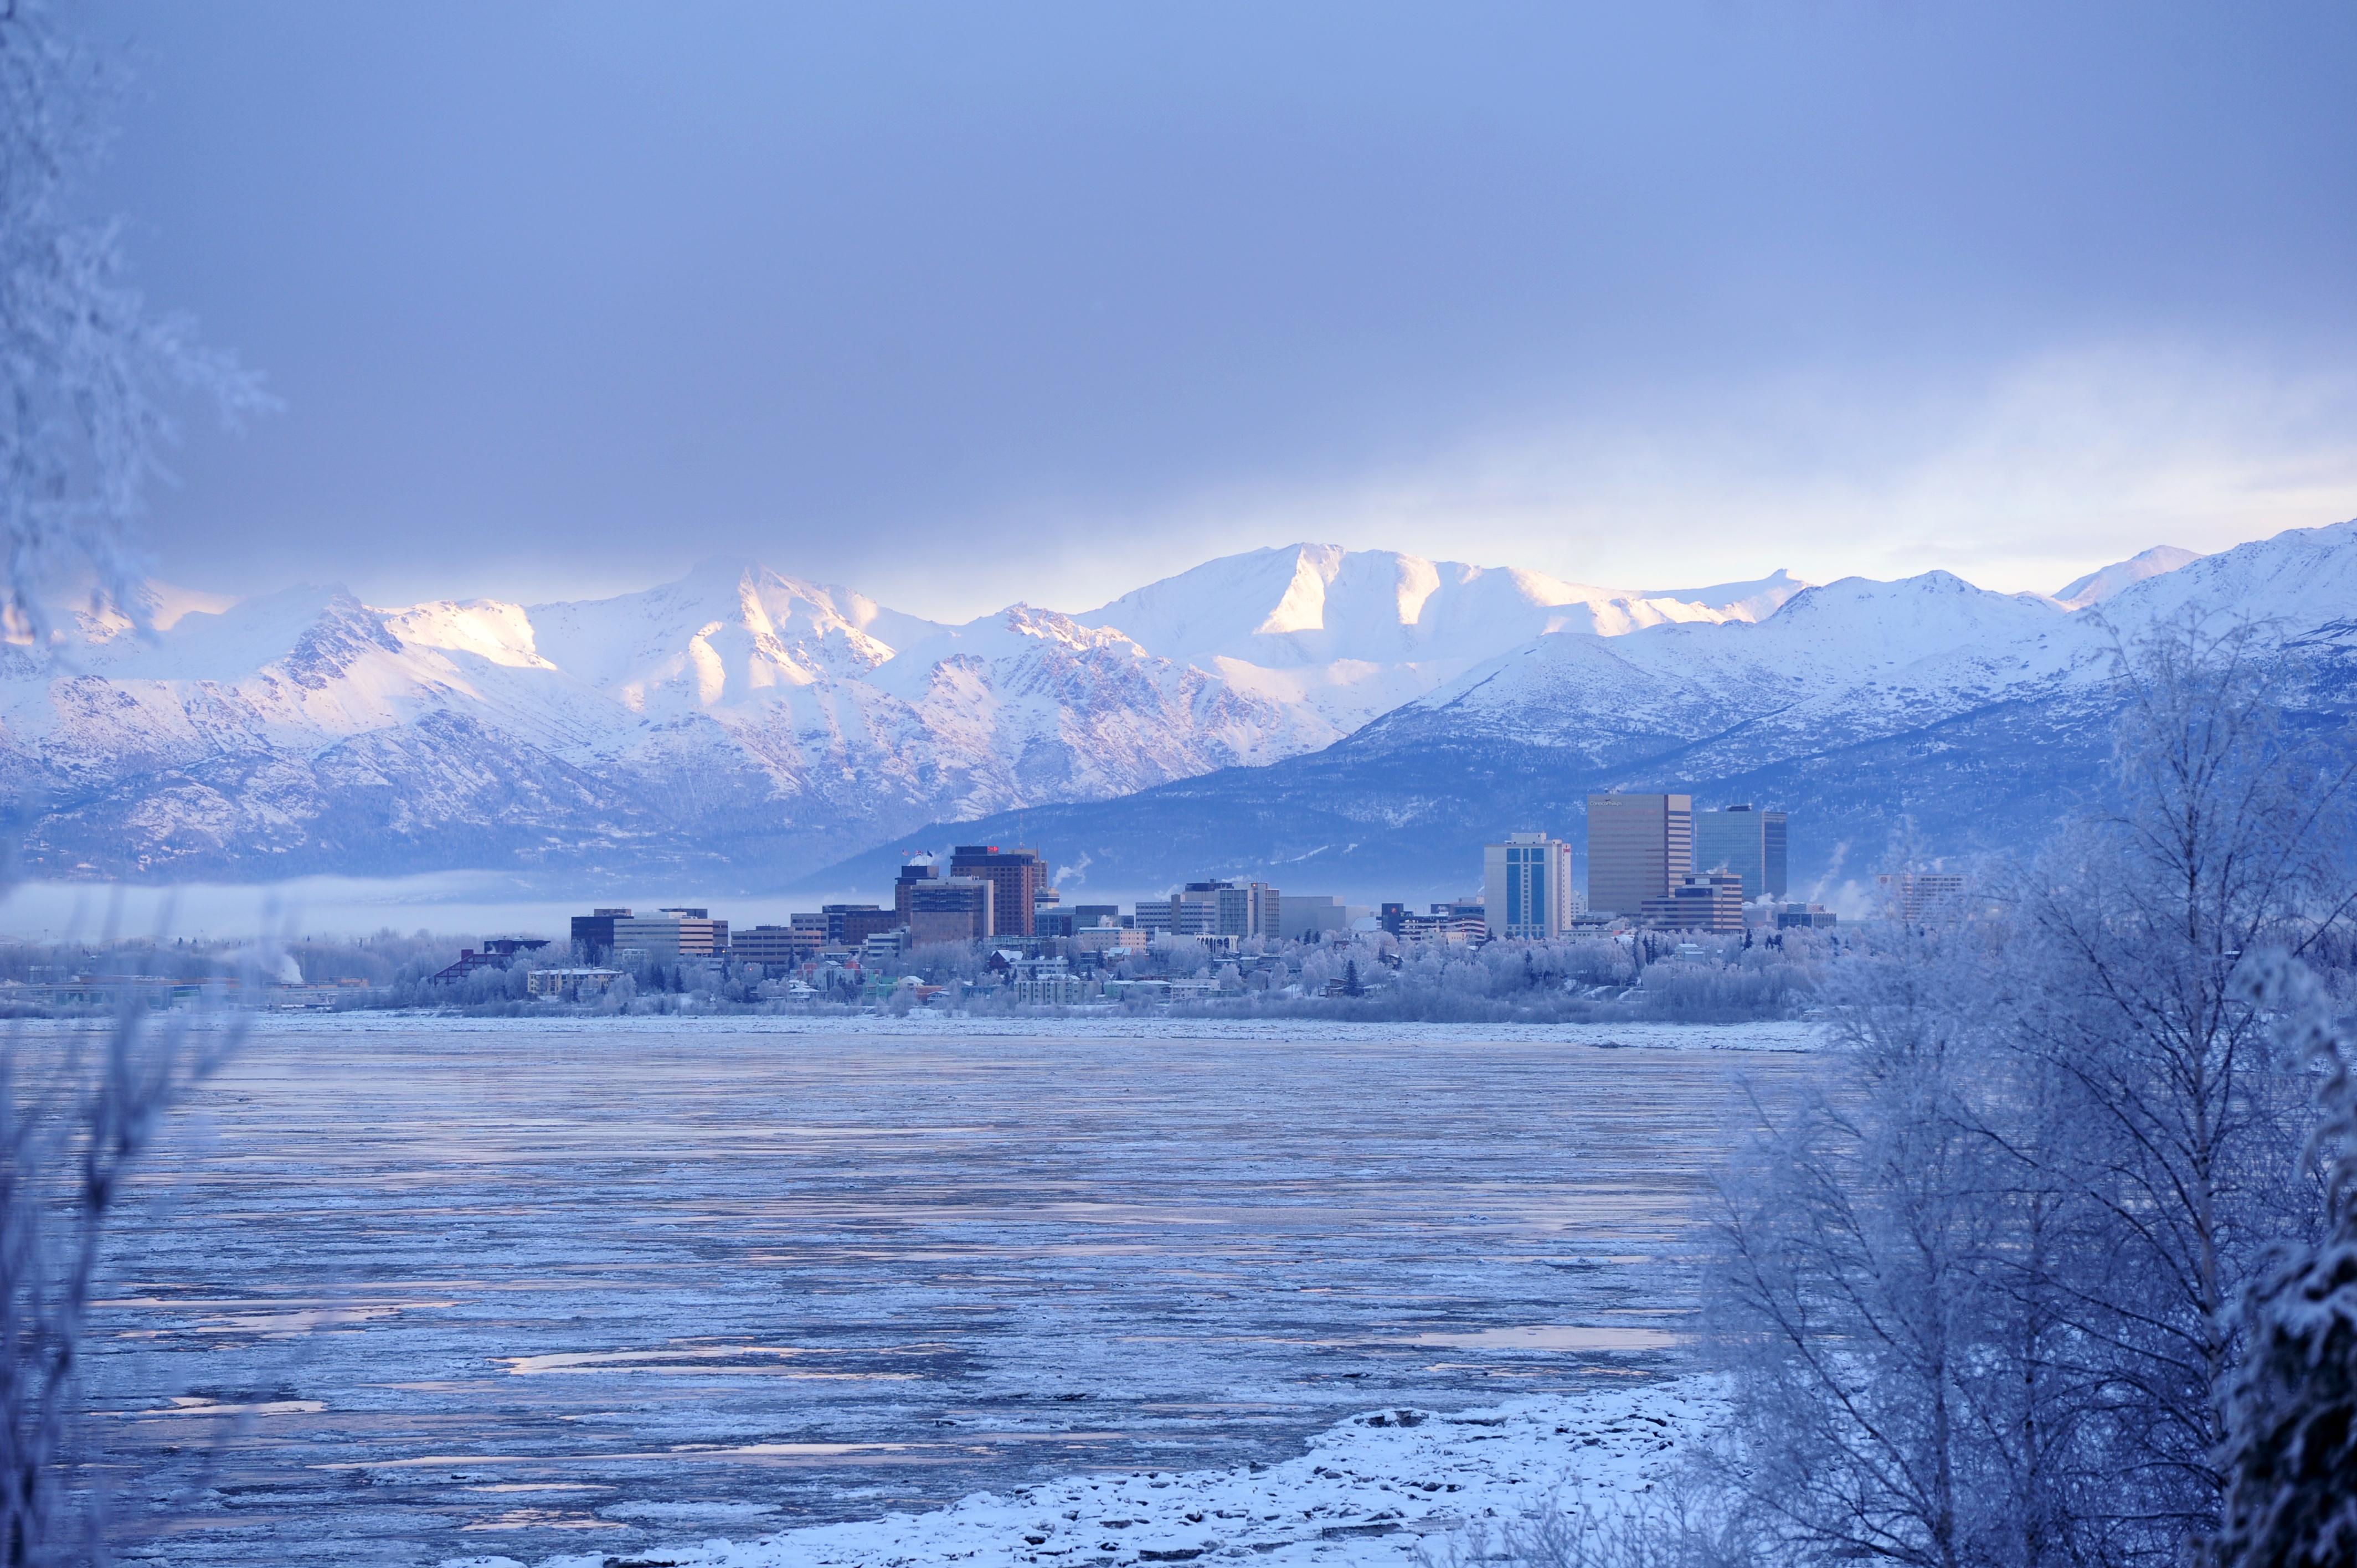 Alaska's 2016 was warmest year on record — by a wide margin